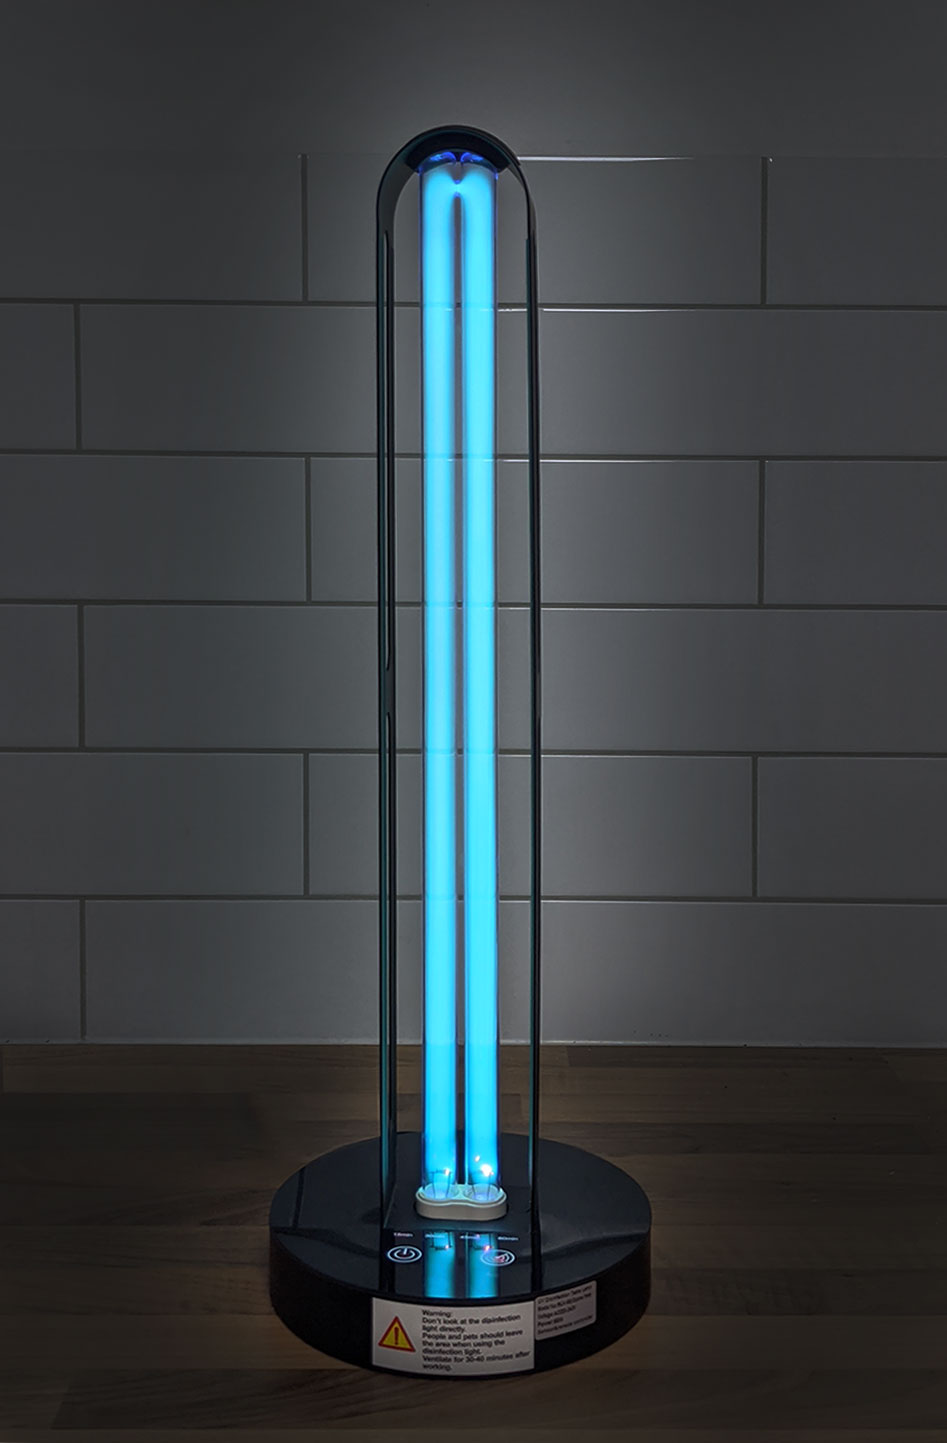 MUVI Disinfection Lamp